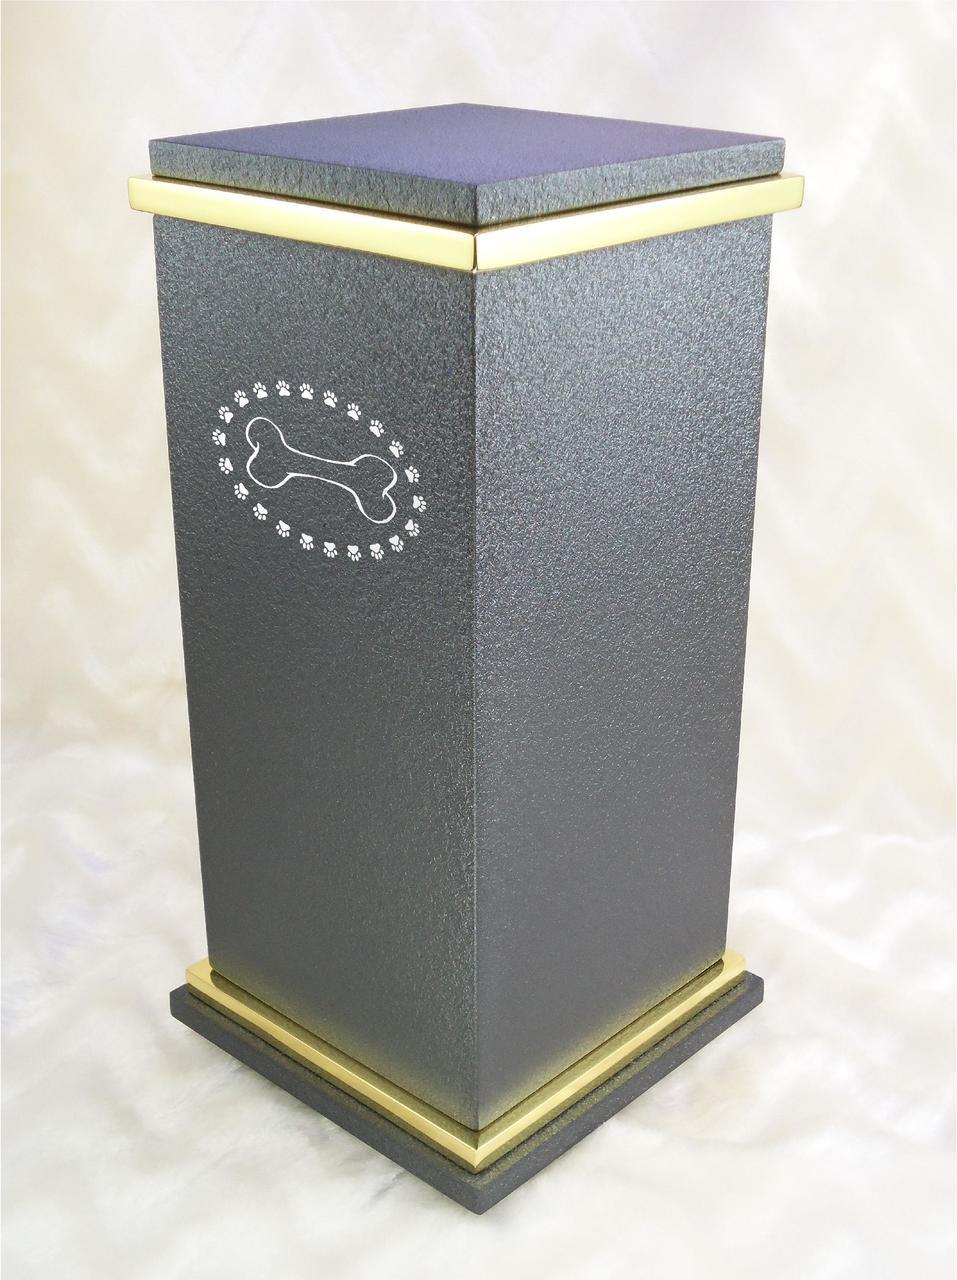 PERSONALIZED RG Custom Engraved Dog Bone Cremation Urn Vault by Amaranthine  Urns, made in the USA